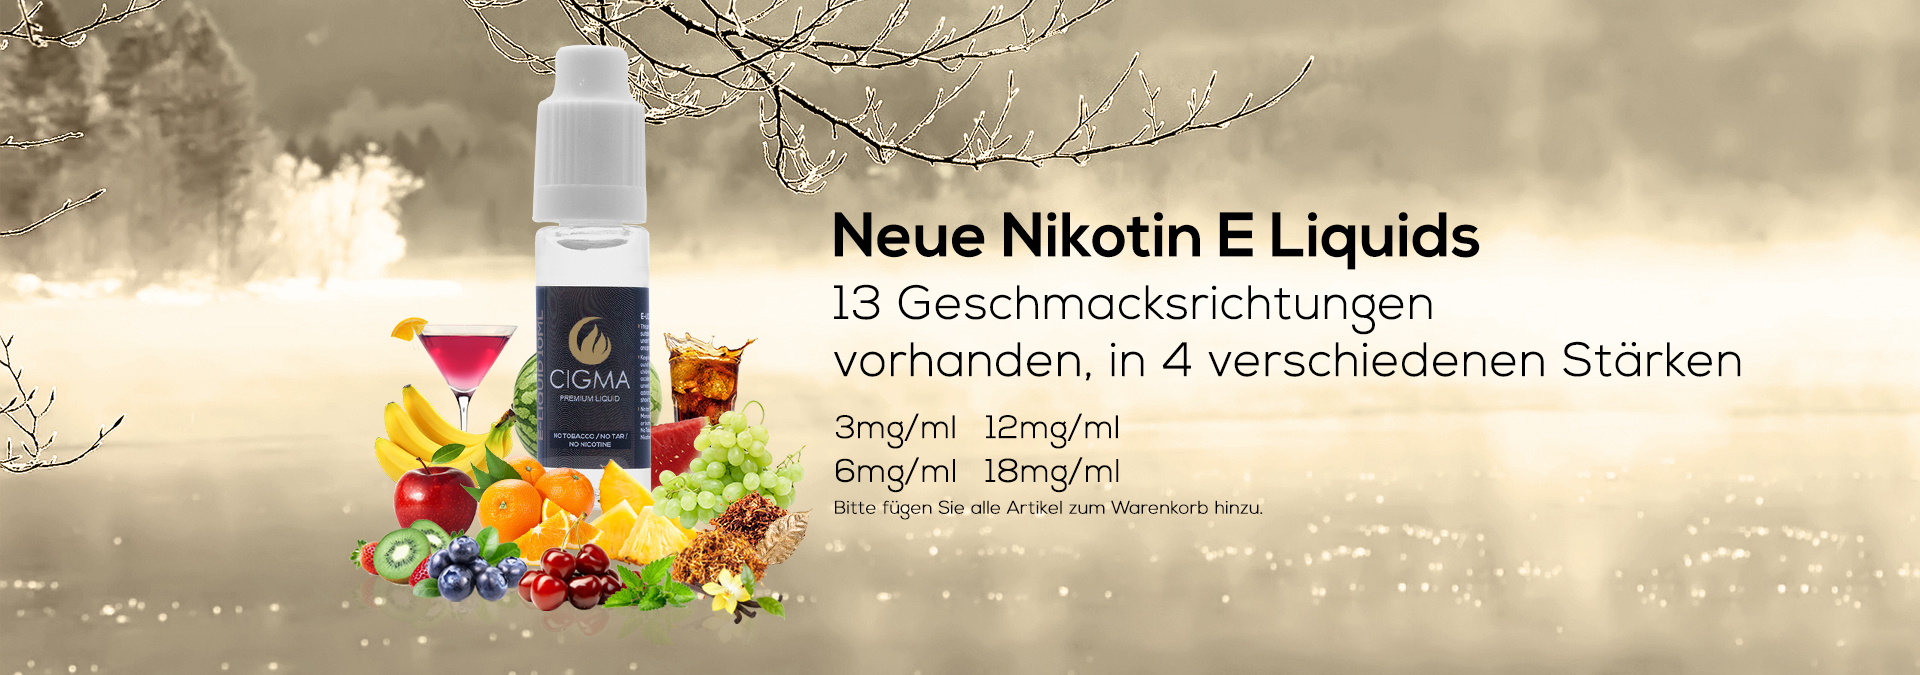 Winter-theme-For-cigmavape-German-Banner-1